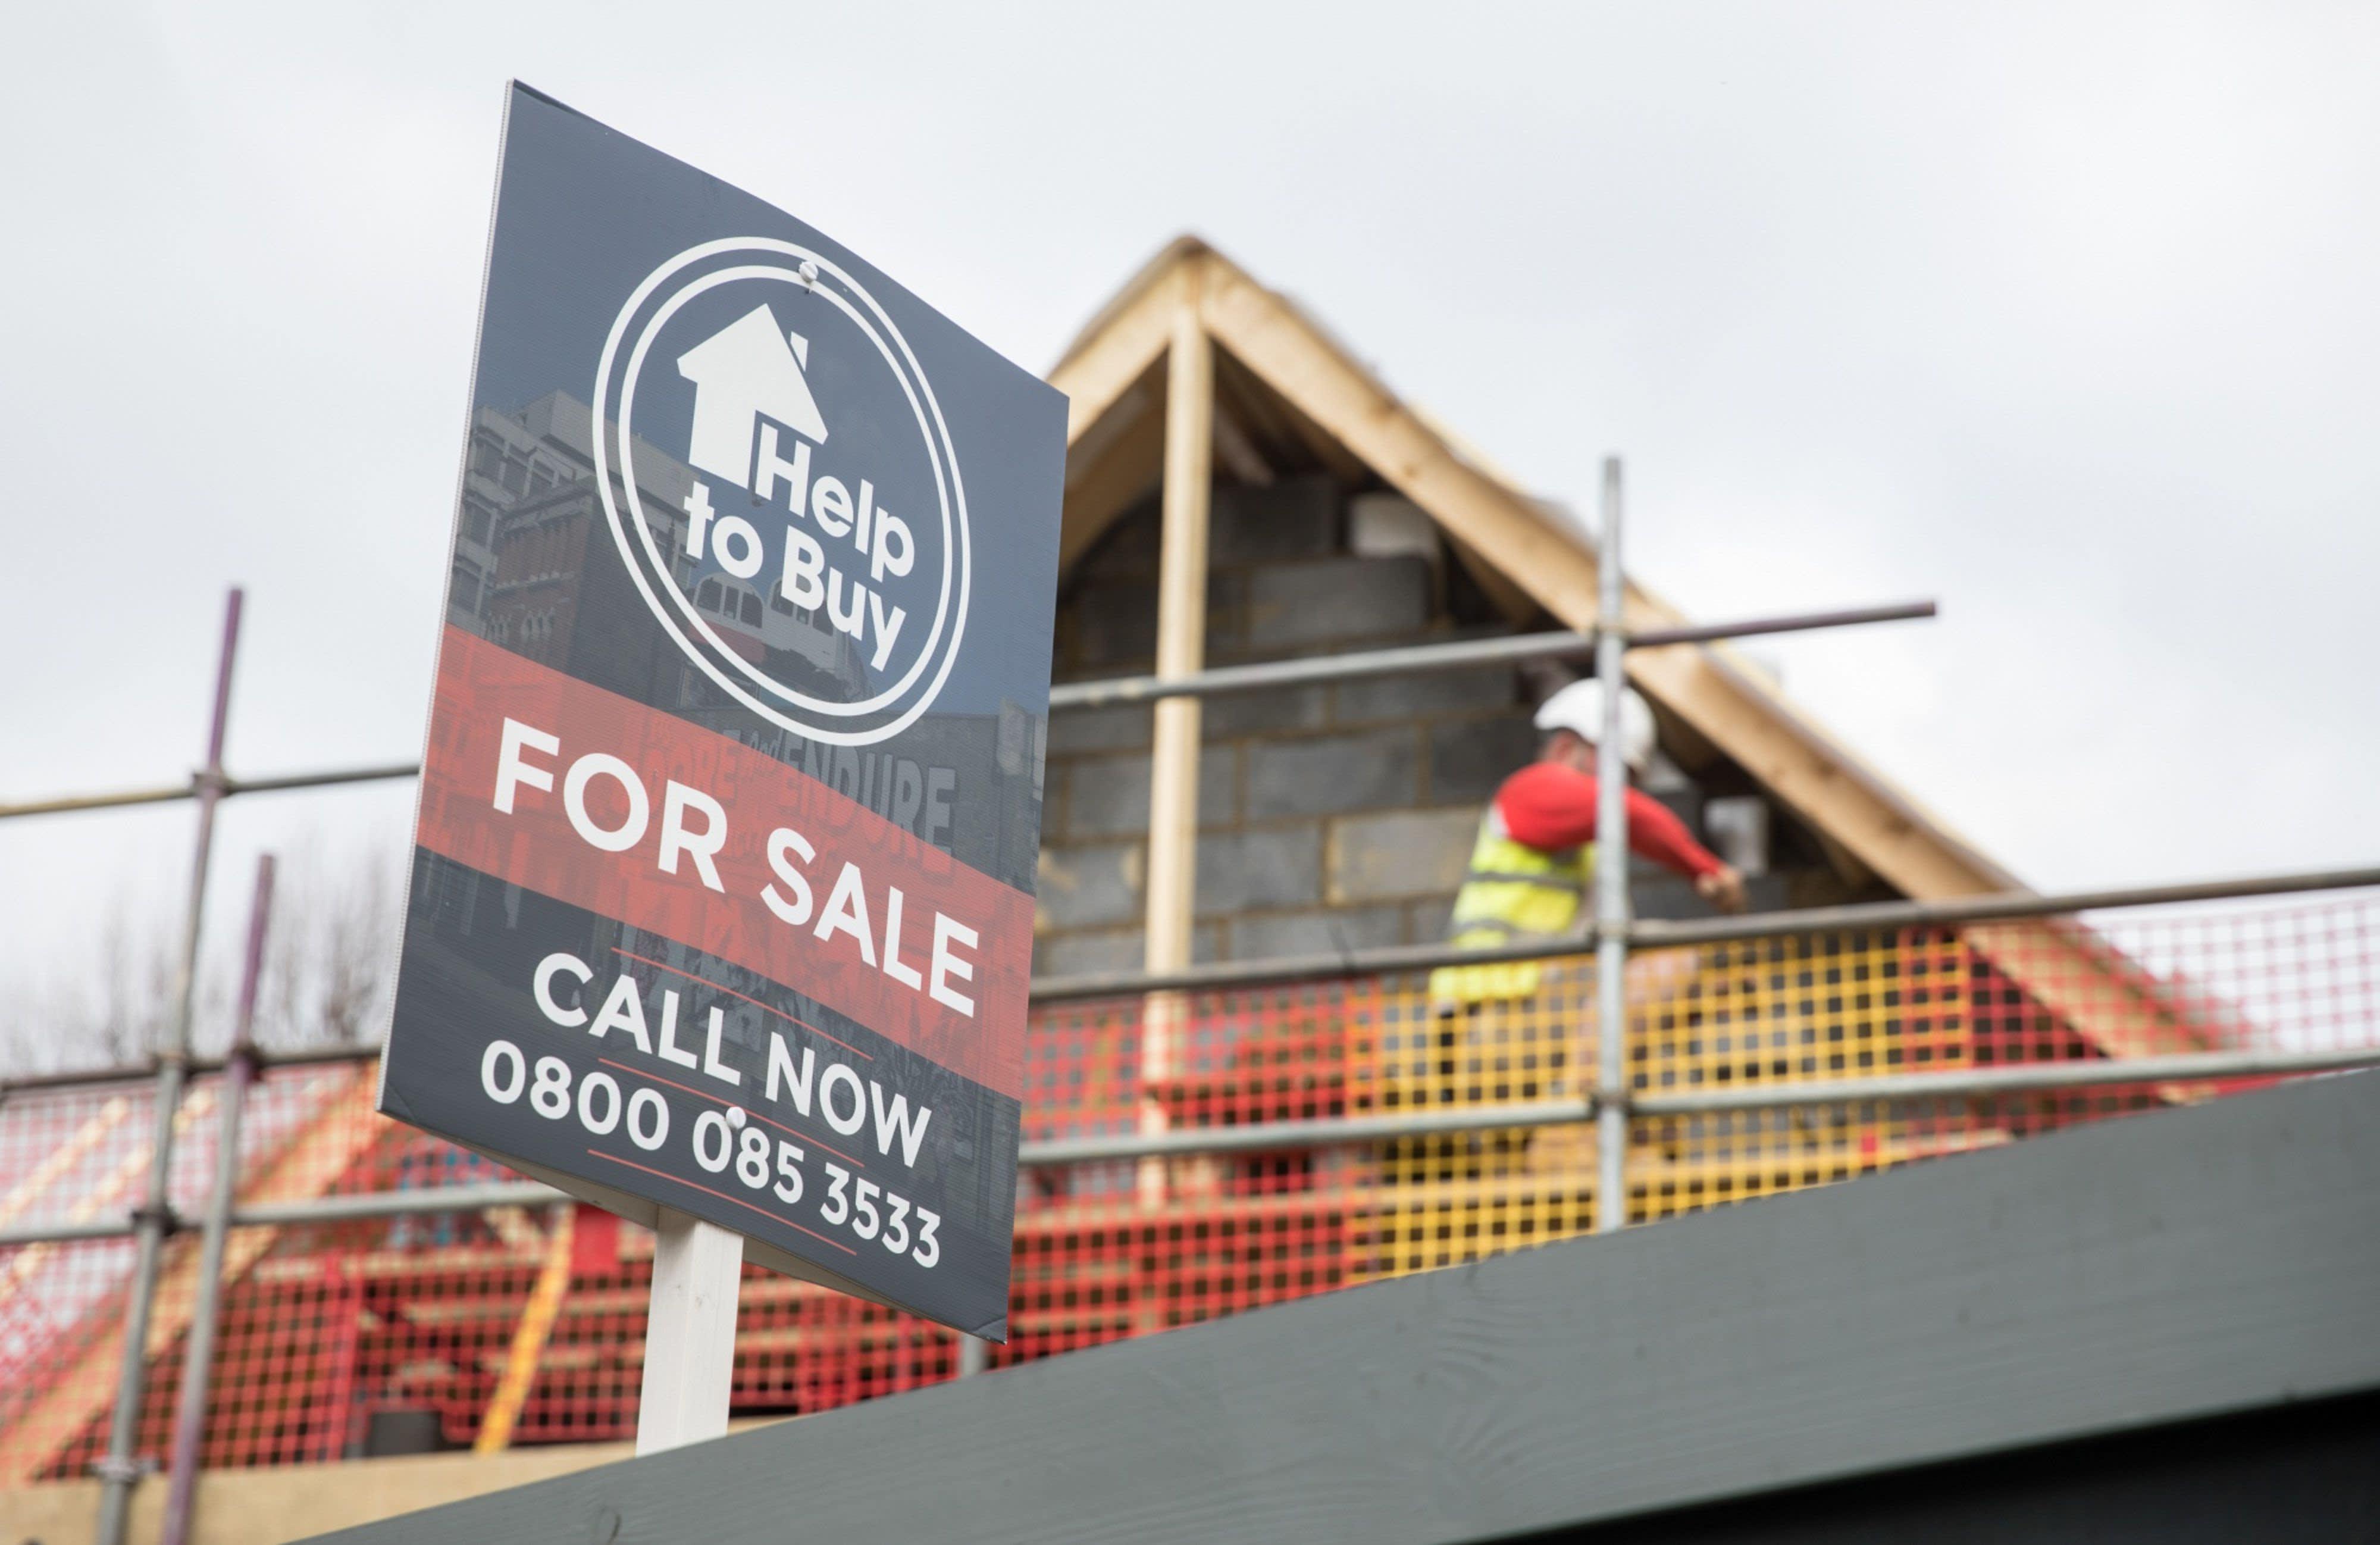 Govt extends Help to Buy completion deadline